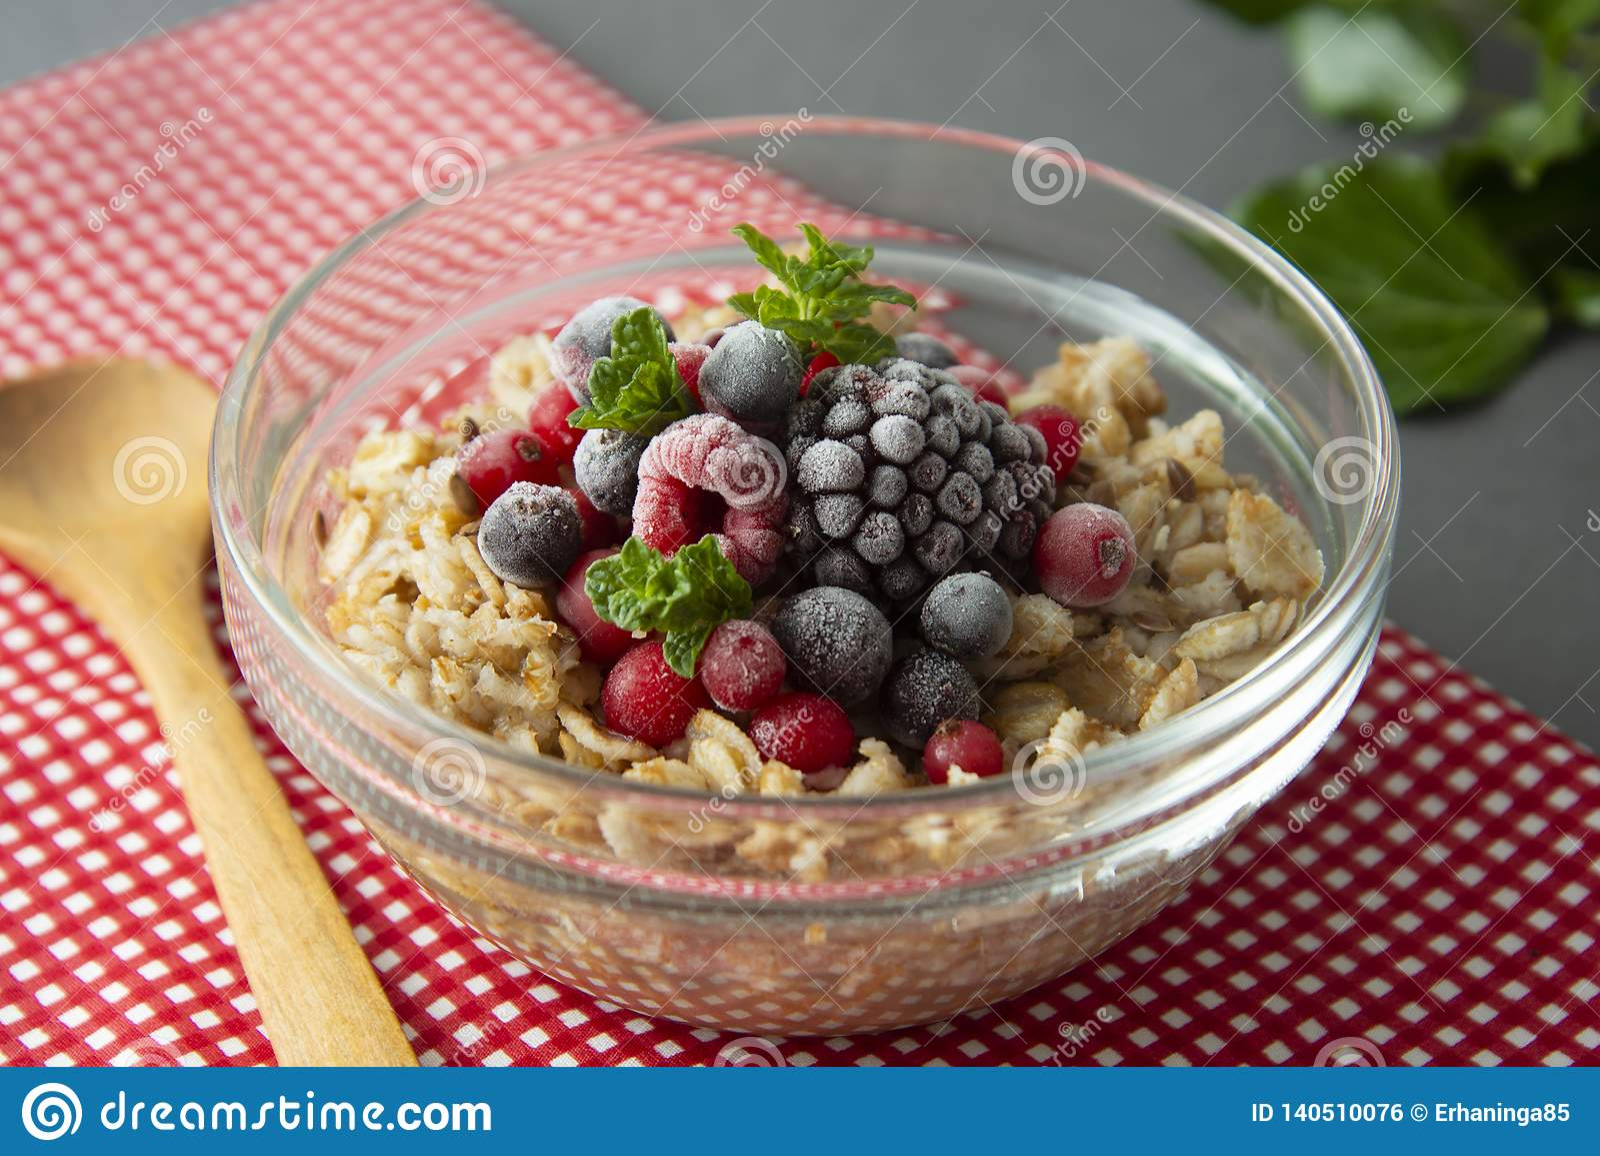 Healthy breakfast in a bowl with oatmeals, frozen berries, fresh strawberries, mint. Oat porridge with fruits